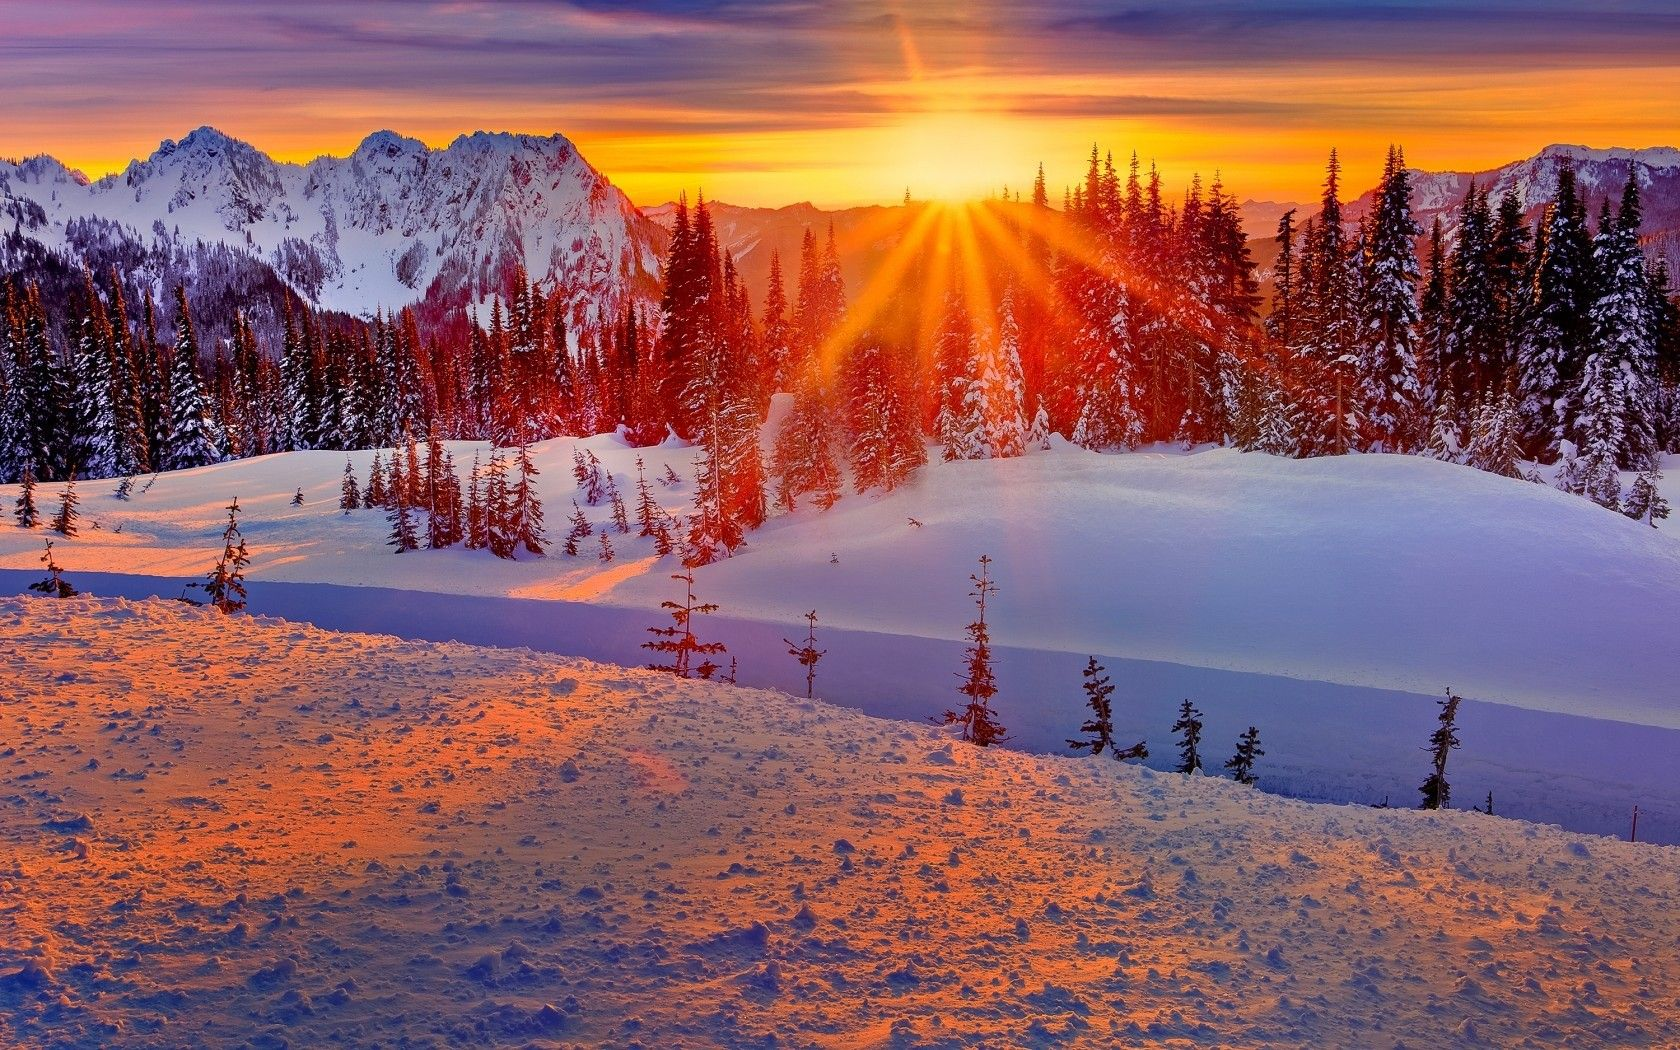 winter mount rainier mountain snow sunset winter nature. Black Bedroom Furniture Sets. Home Design Ideas